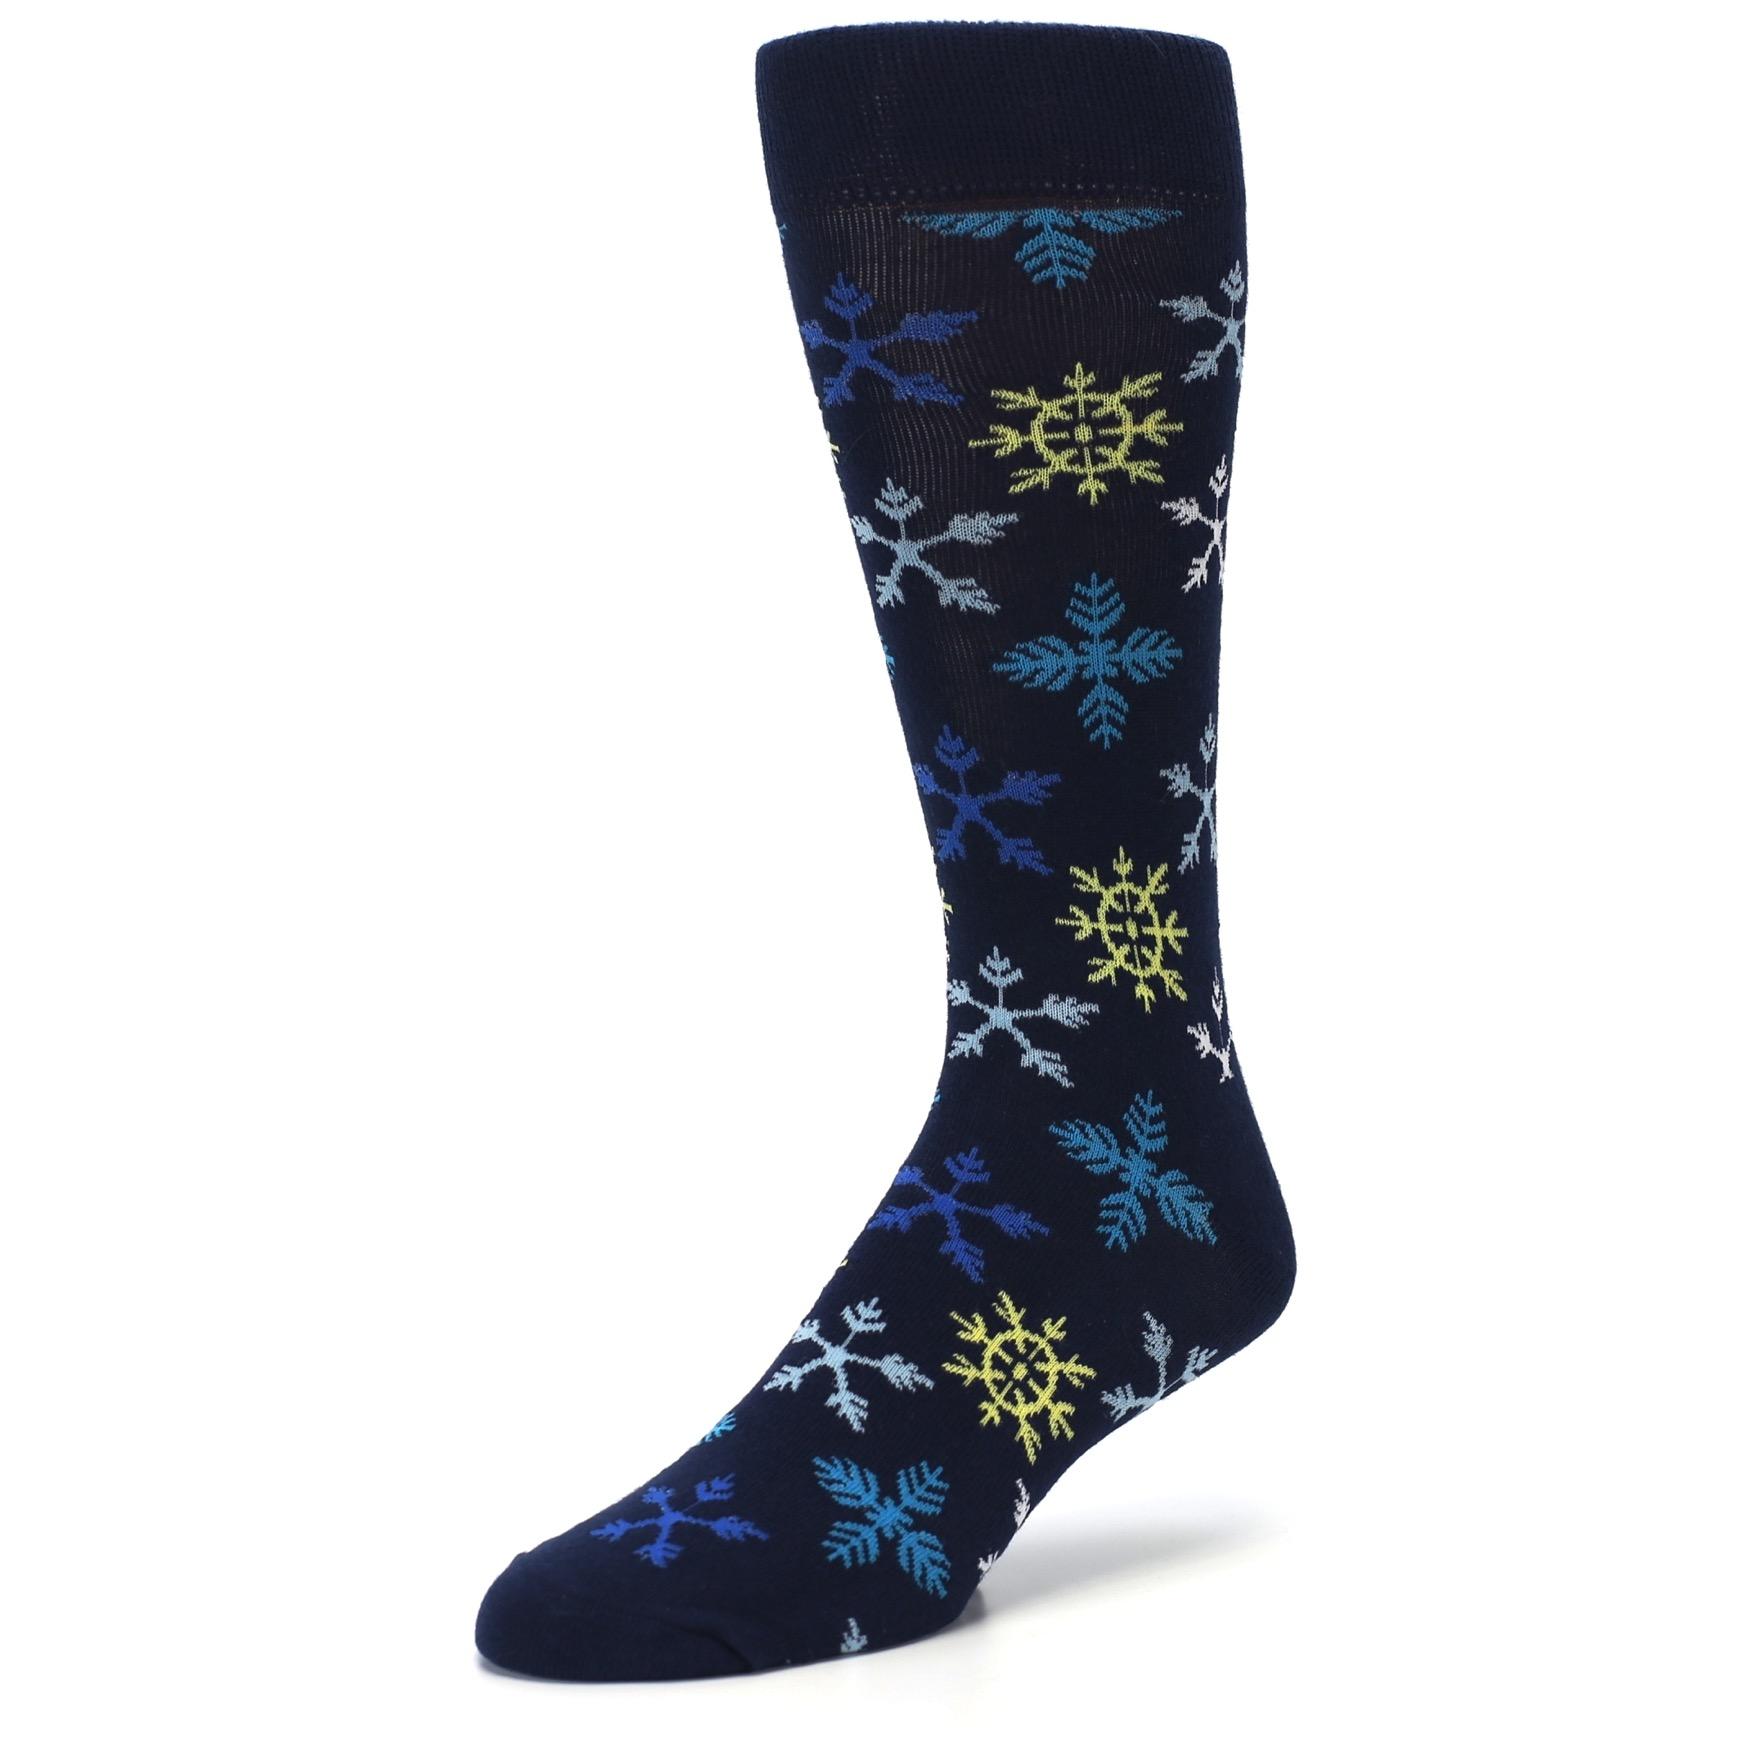 Navy Winter Snowflakes Mens Dress Socks Boldsocks Snow Flakes